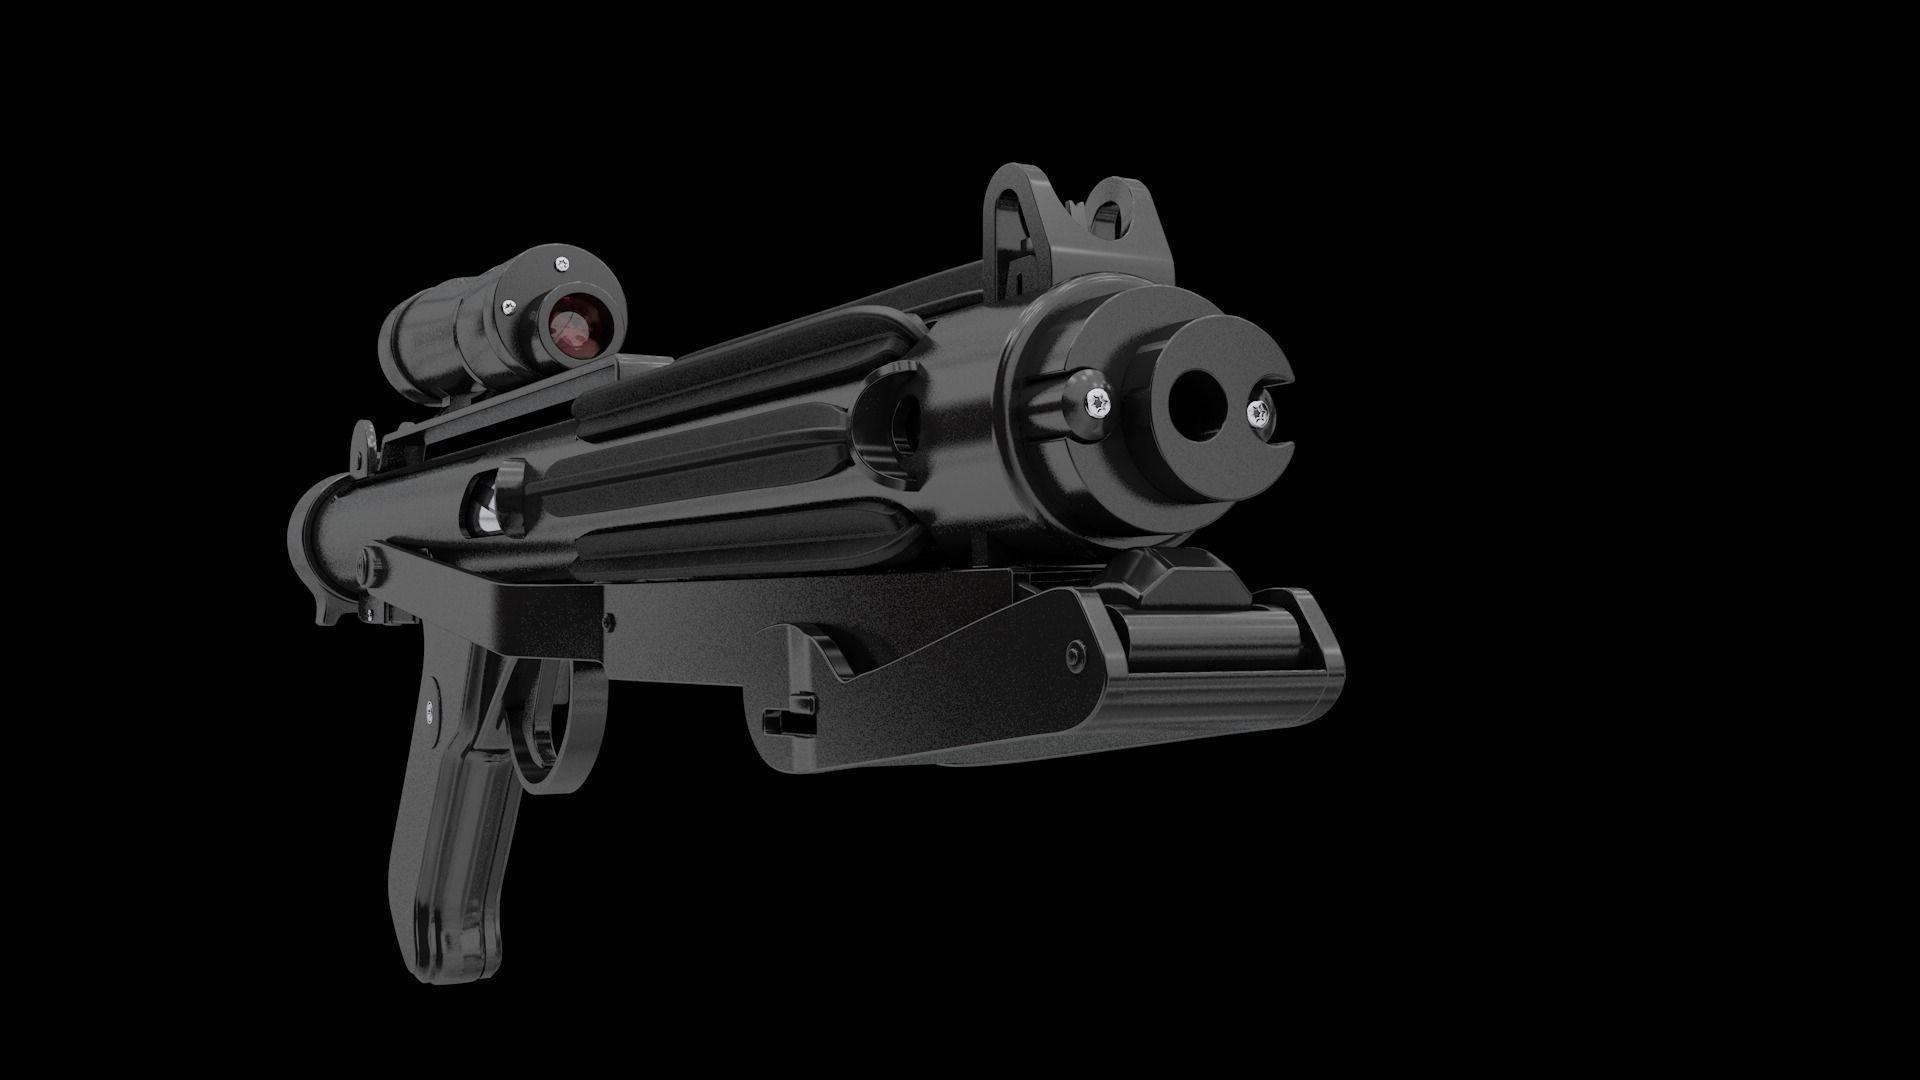 … e11 imperial stormtrooper blaster 3d model 3ds c4d stl 3 …